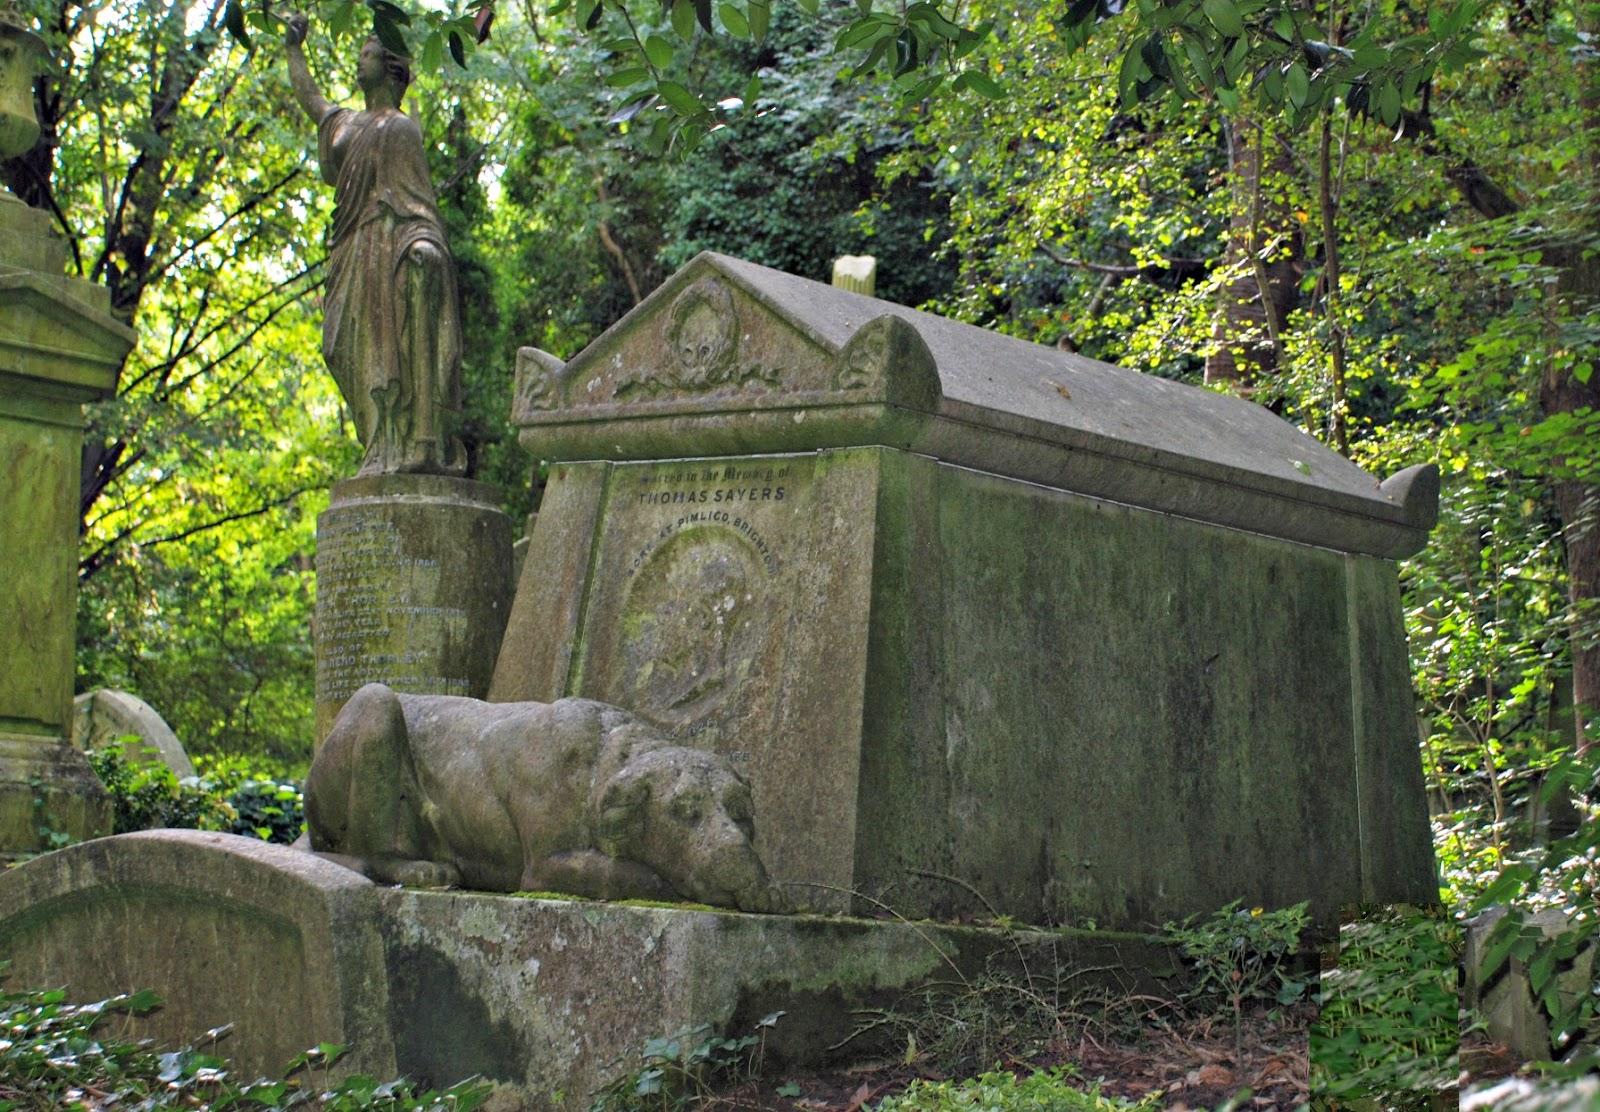 Thomas Sayers' memorial, Highgate Cemetery, London